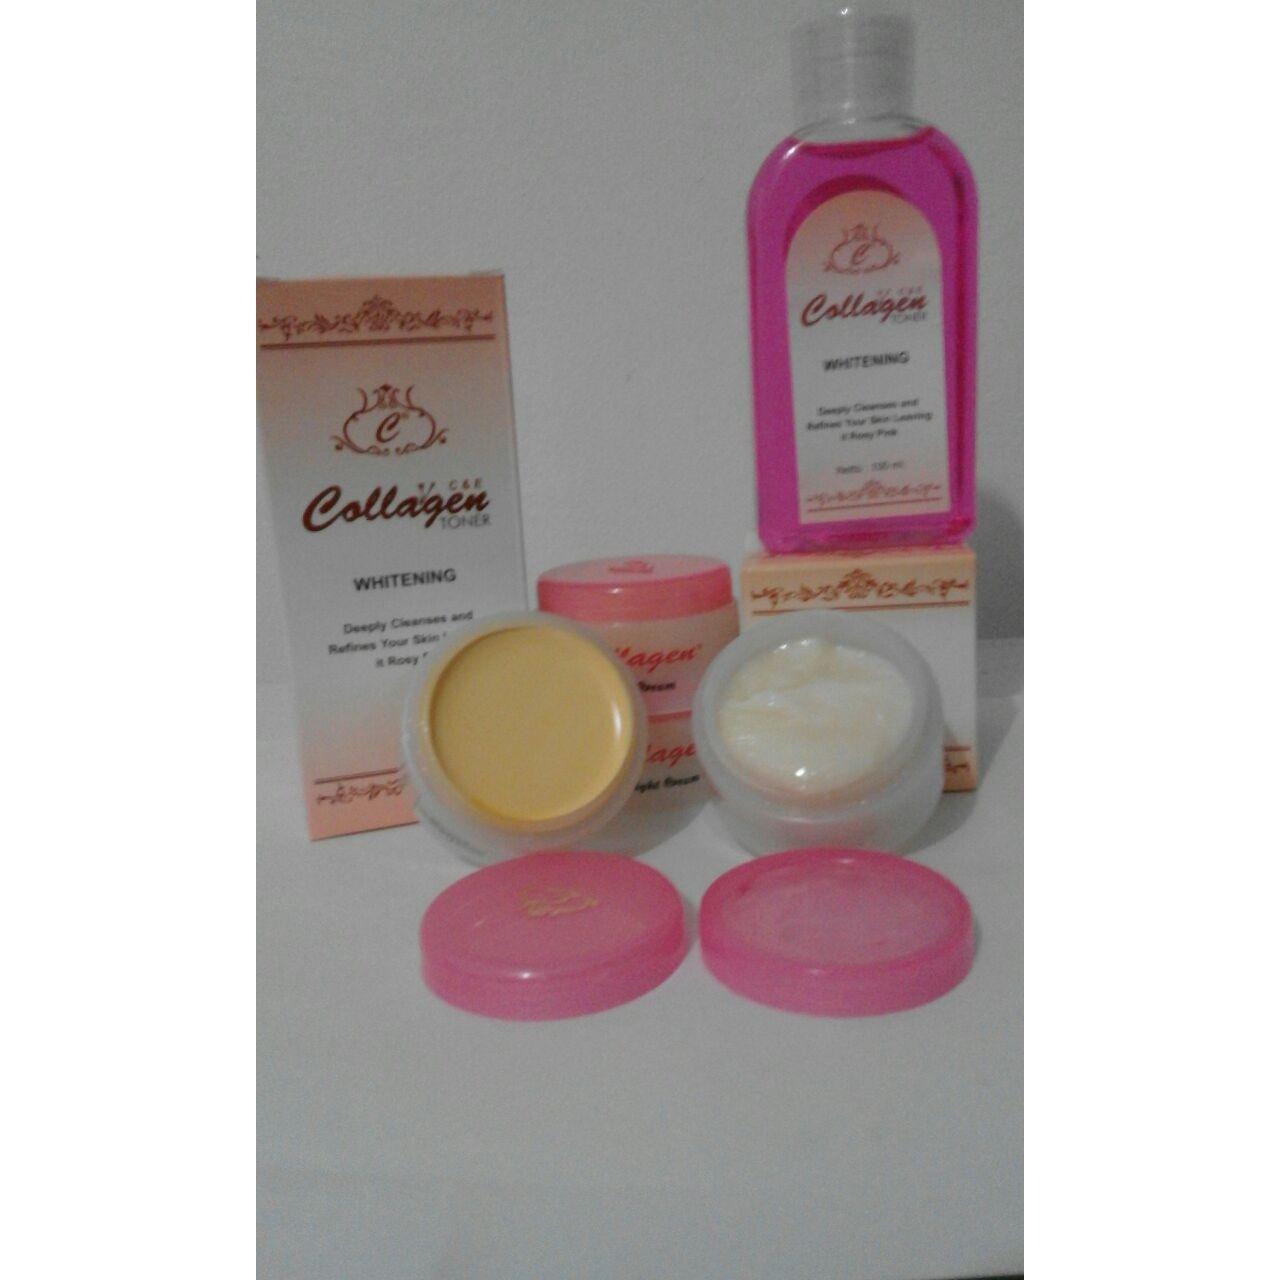 Harga Eceran Collagen Abe Termurah 2018 Bibit Original Netto 150ml Paket Hemat As Cream Day Night Toner Plus Vitamin E